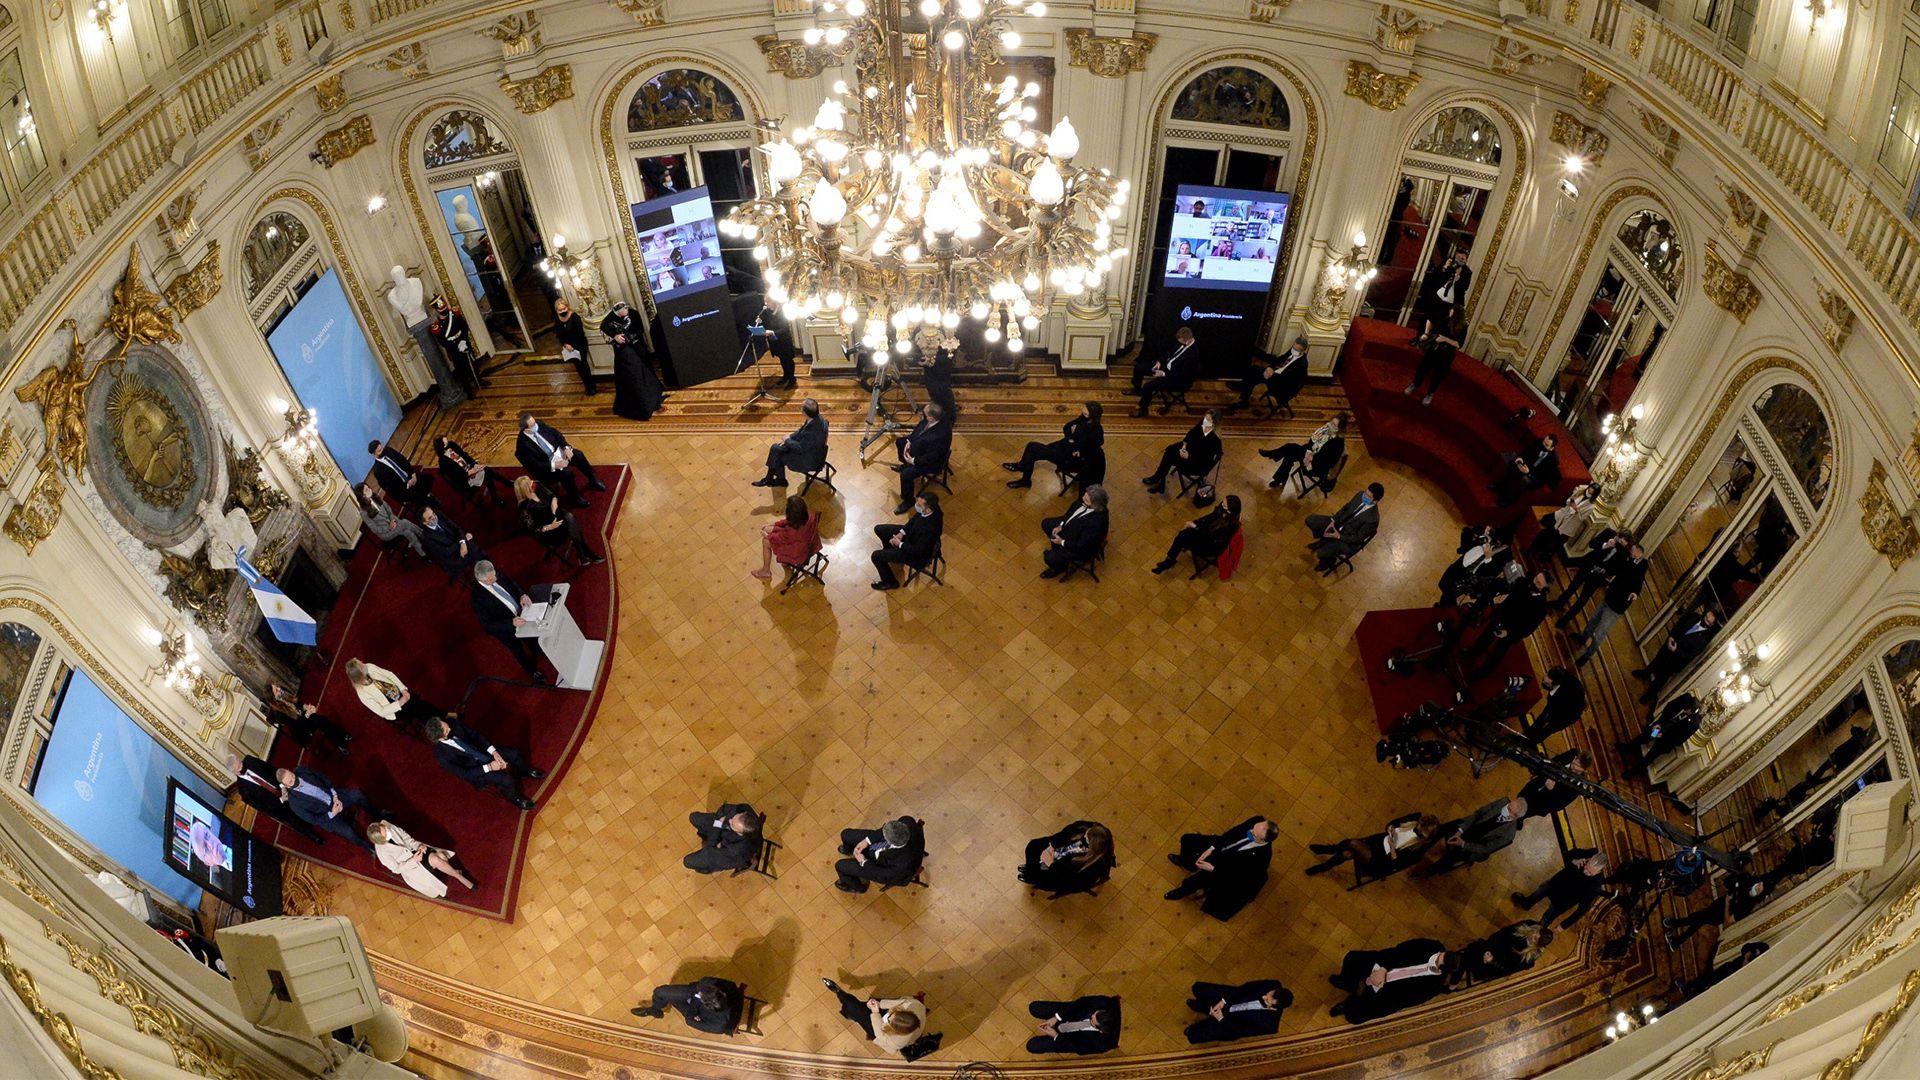 reforma judicial alberto fernandez casa rosada reunion 29-7